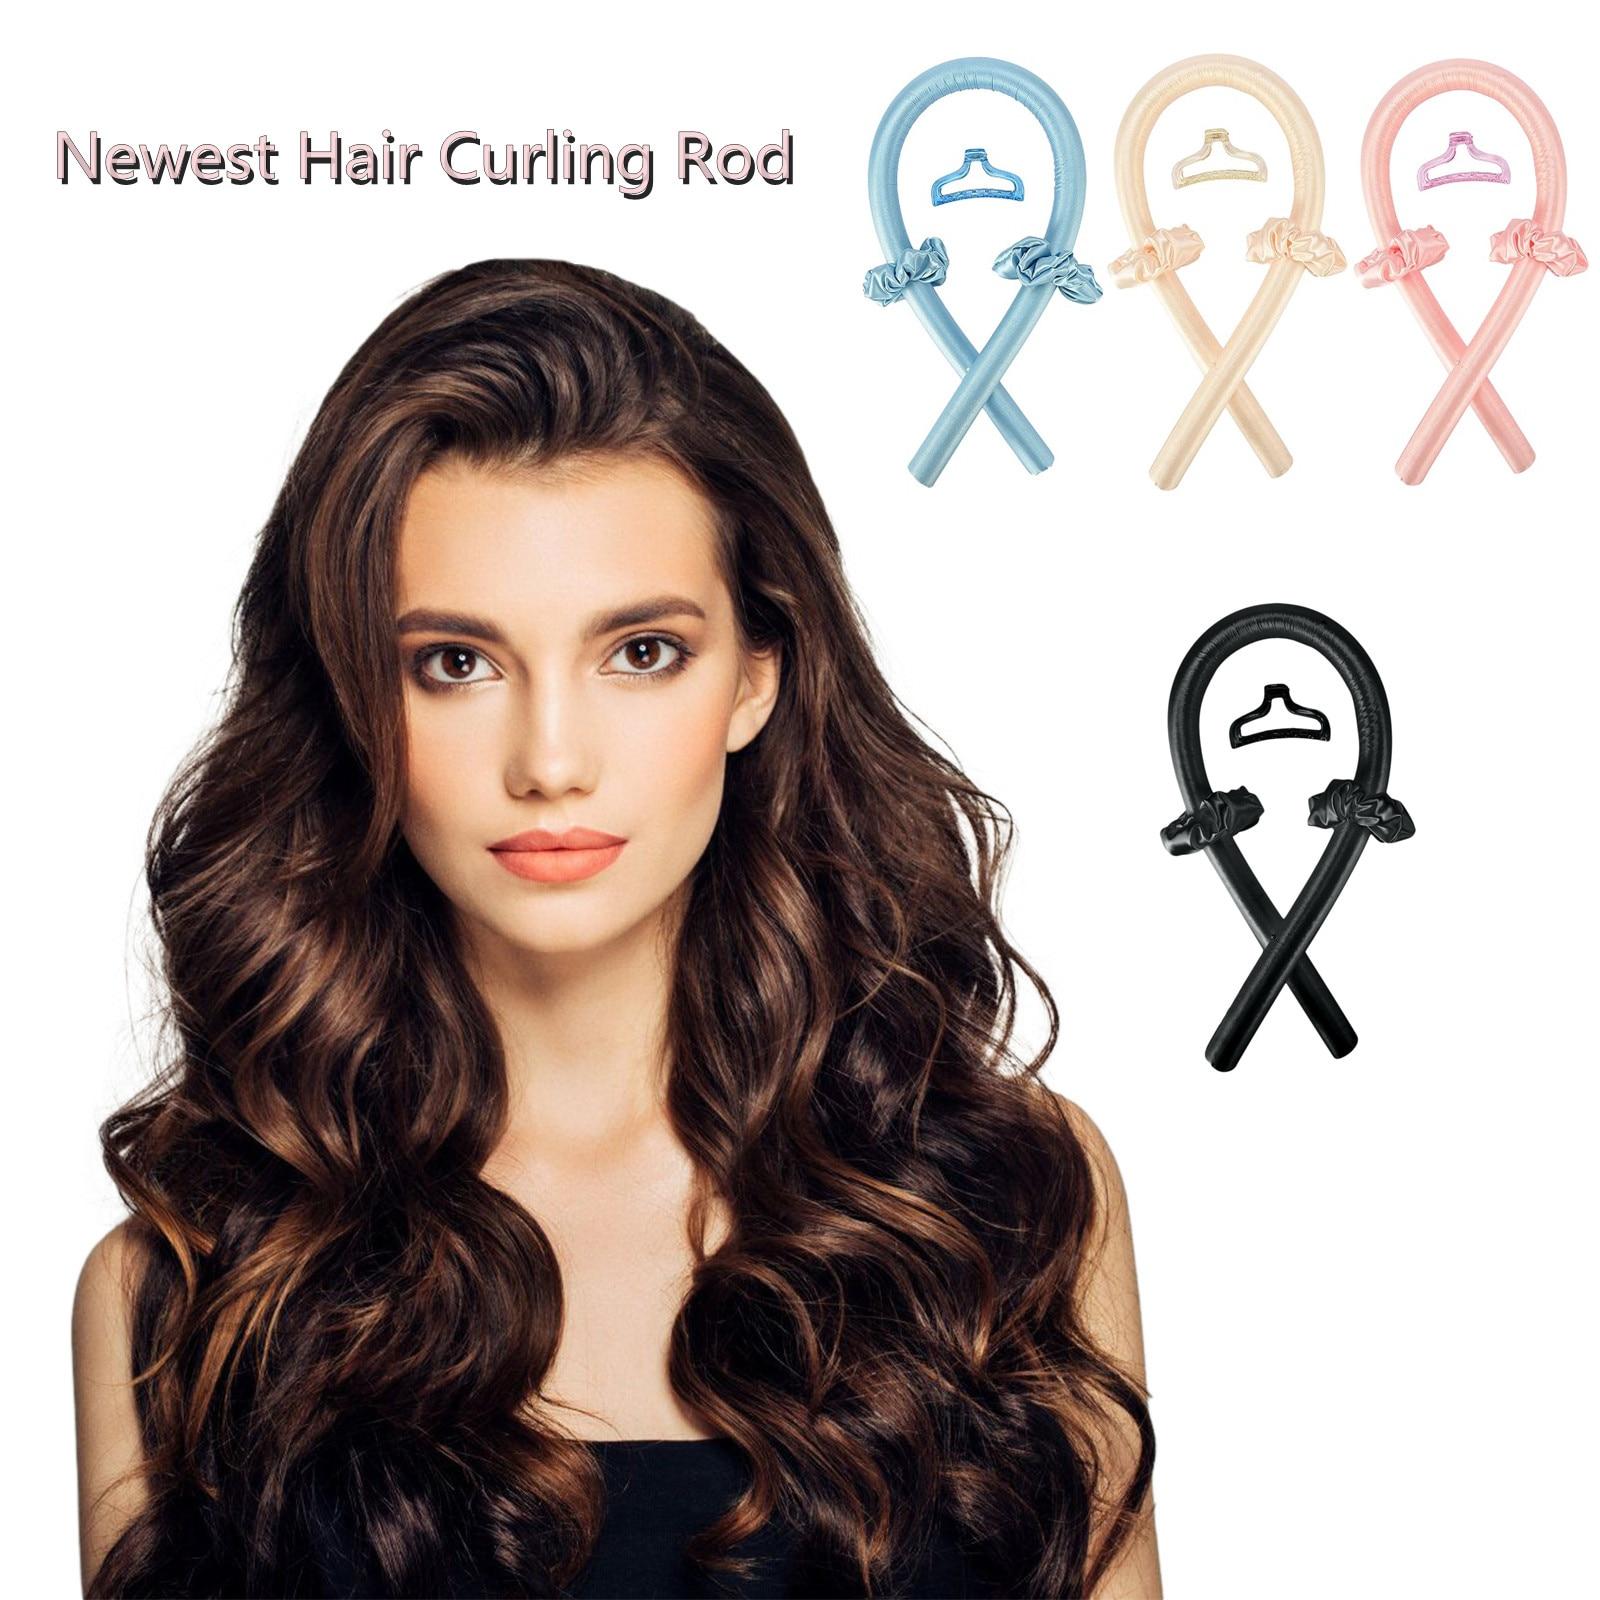 No Heat Curling Rod Heatless Curling Ribbon Curling Iron Sleeping Soft Hair Curling Iron Hairdressing Tool Hair Rollers